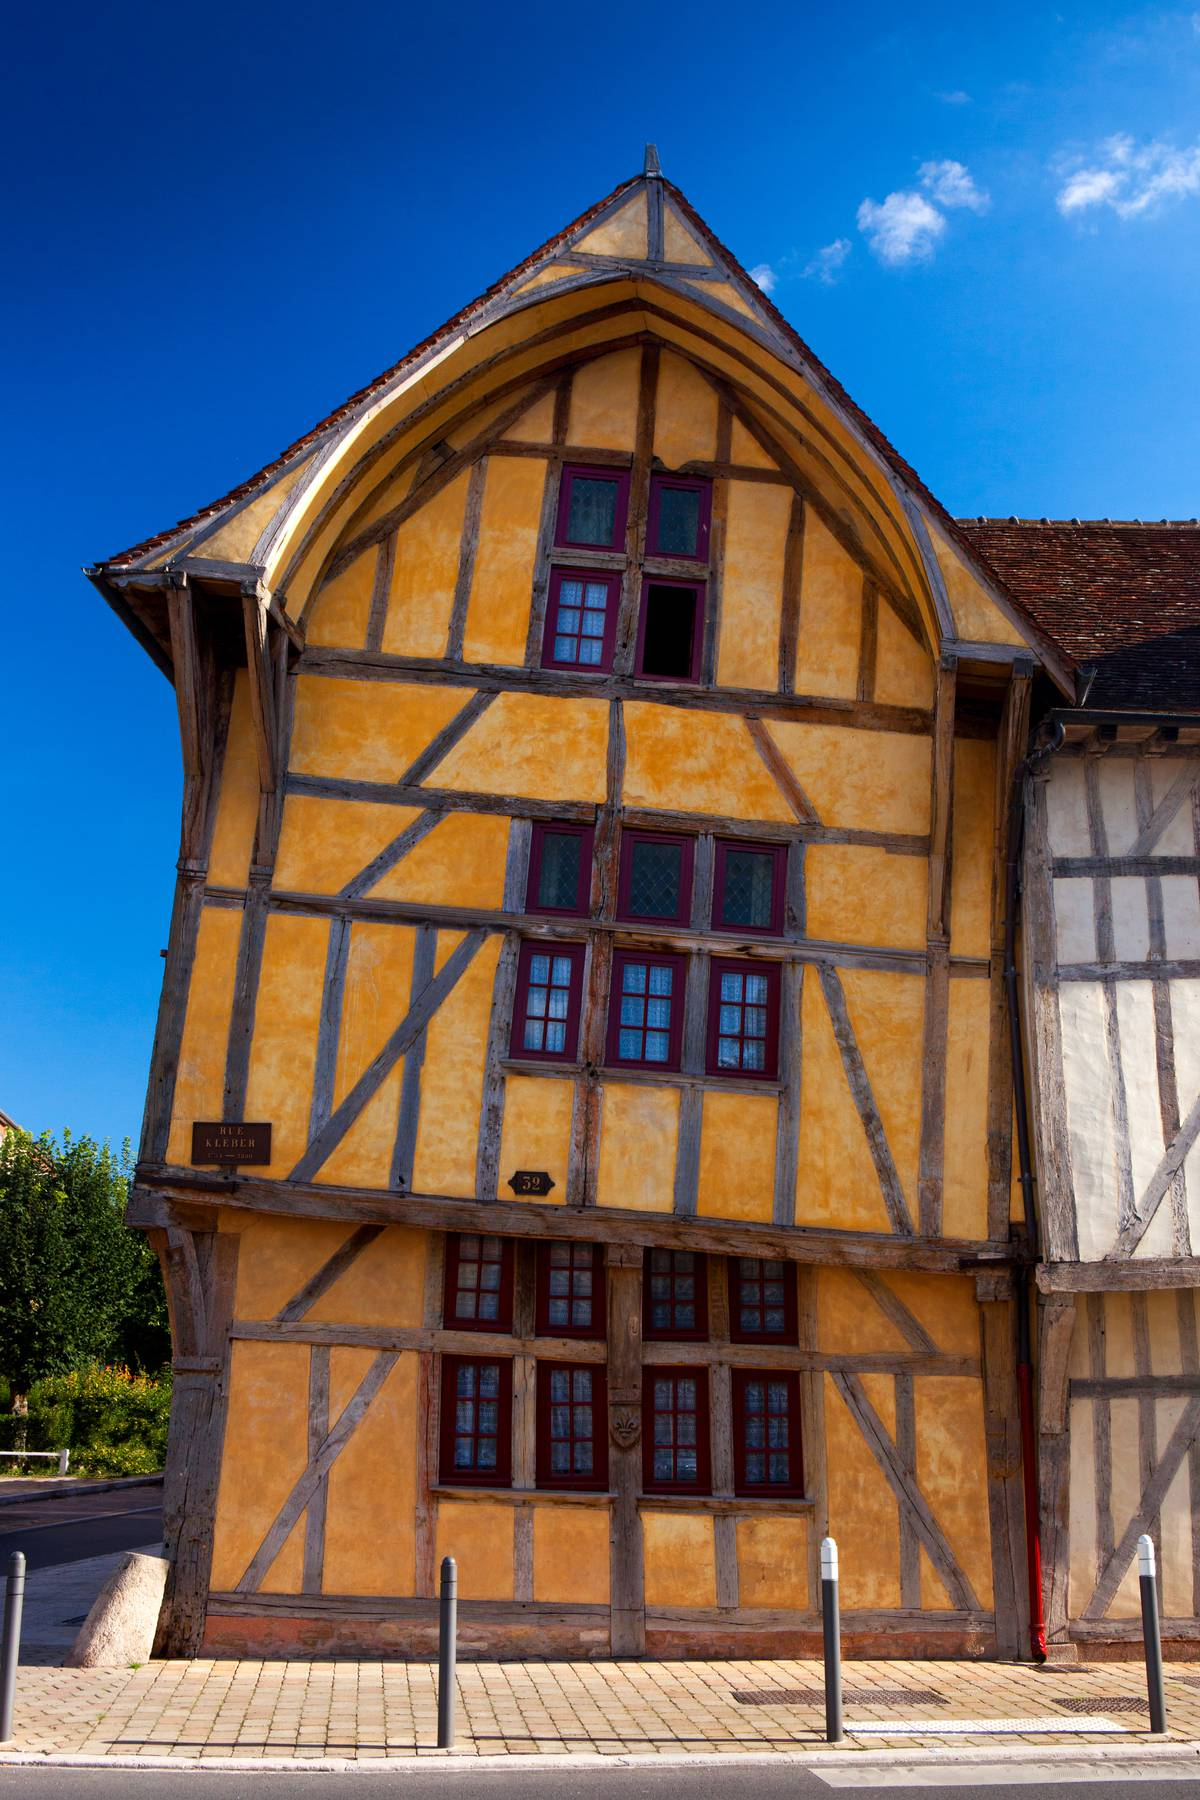 Maison à Pan De Bois : maison, Troyes,, Timber-framed, Troyes, Champagne, Tourism